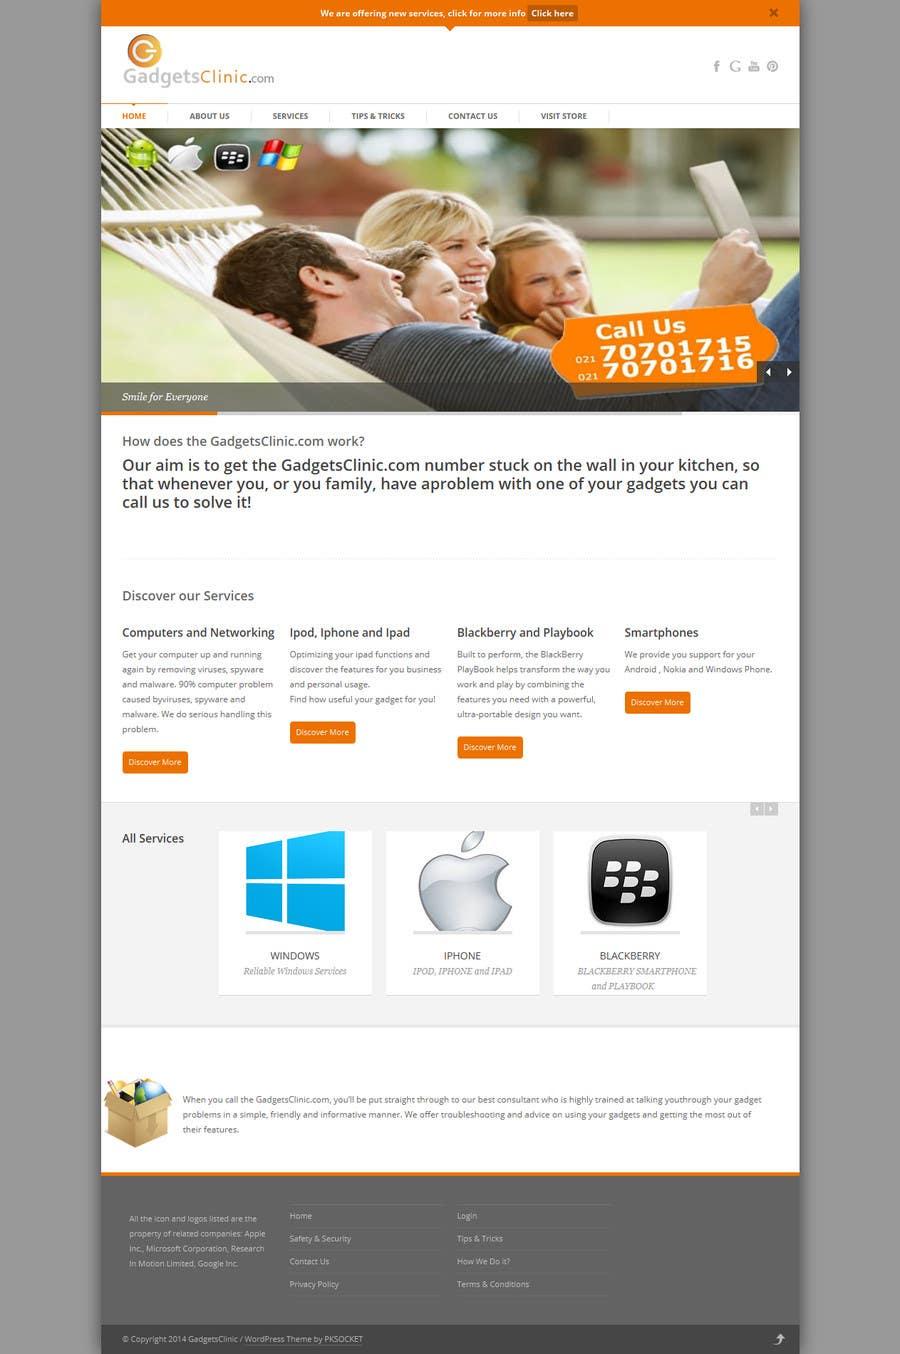 Penyertaan Peraduan #                                        7                                      untuk                                         redesign website www.GadgetsClinic.com